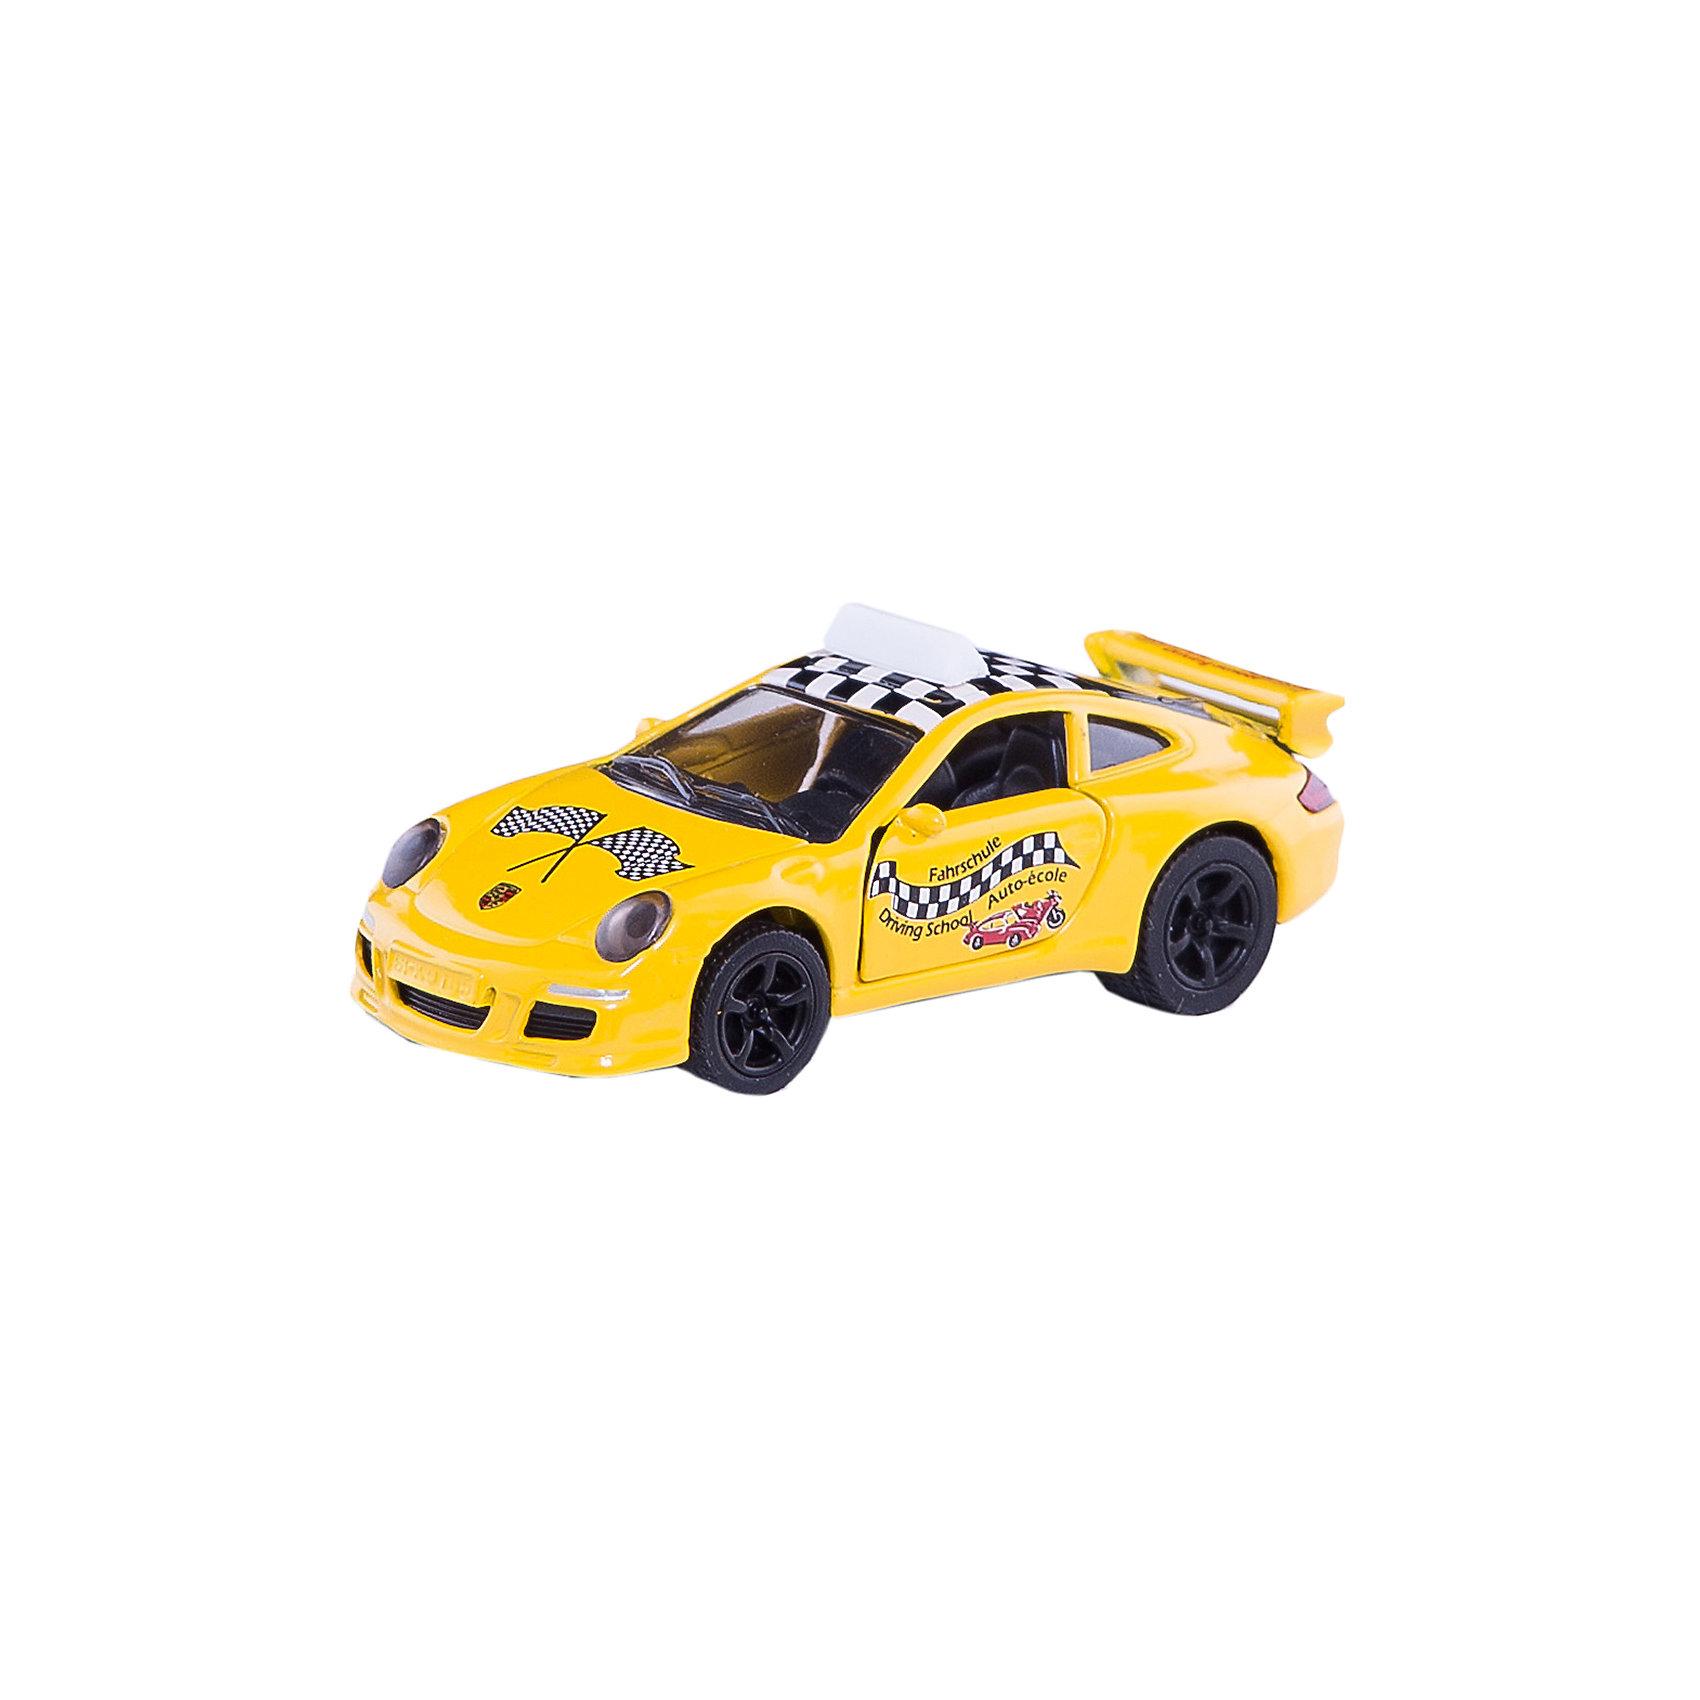 SIKU Порше 911 Автошкола, SIKU купить юбку бампера порше 911